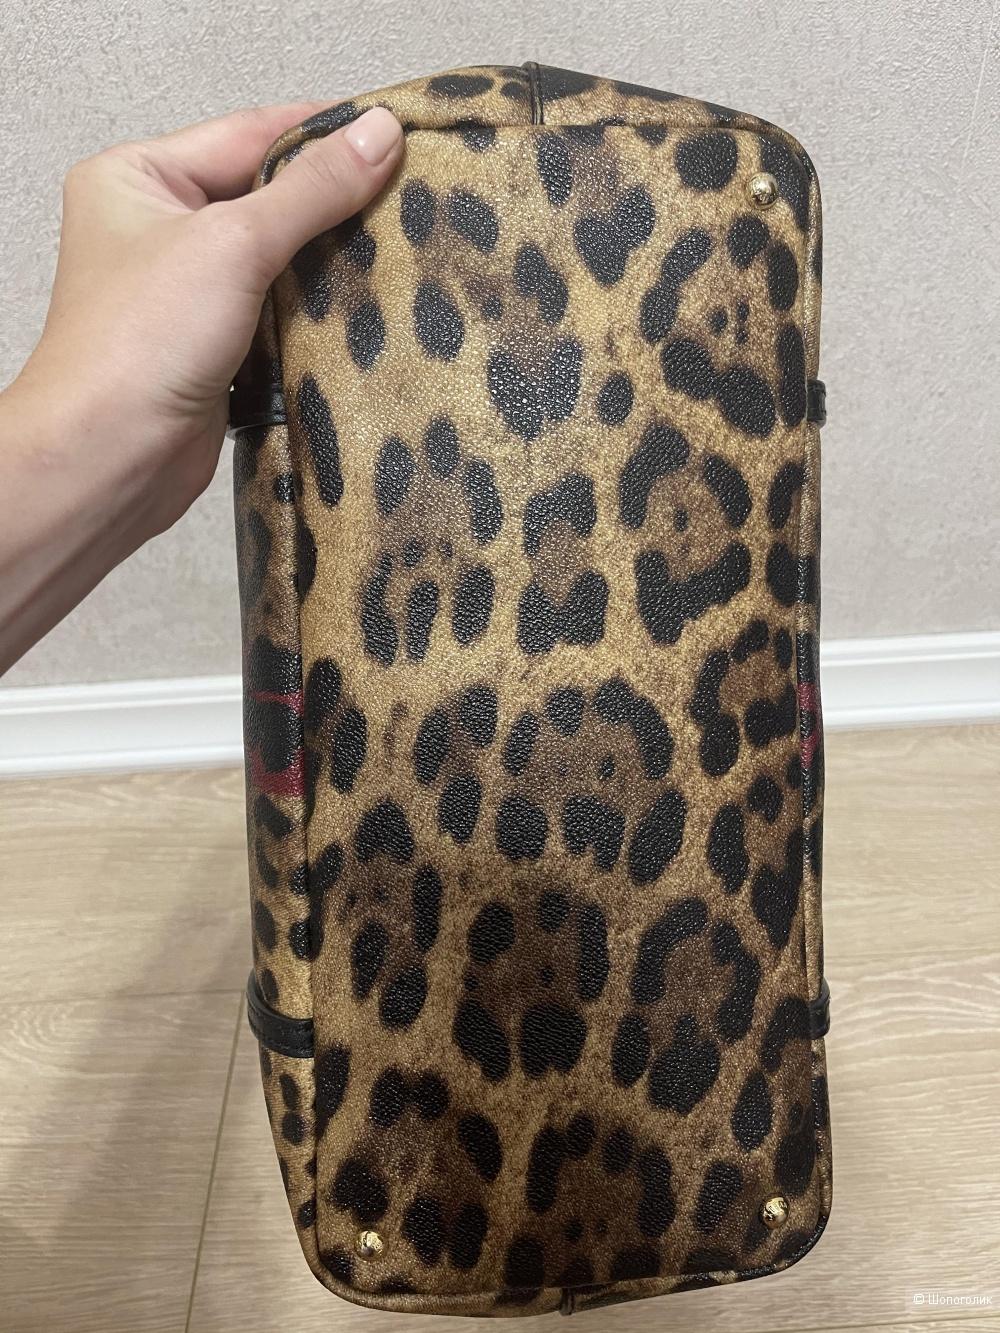 Сумка Dolce&gabbana размер 47 на 28 см